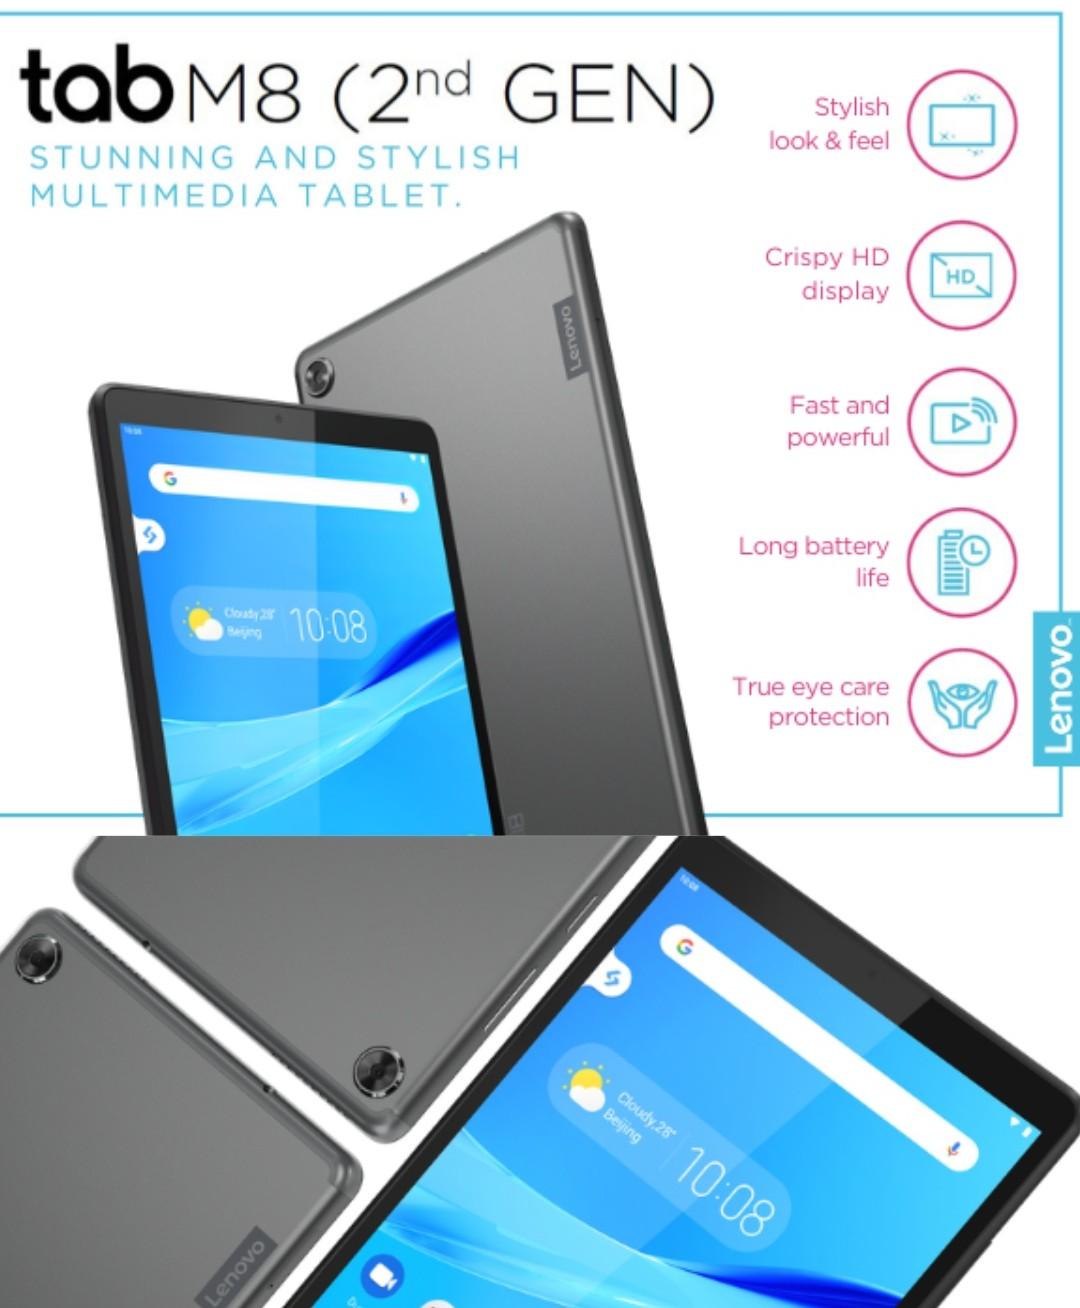 lenovo tab m8 tablet specs